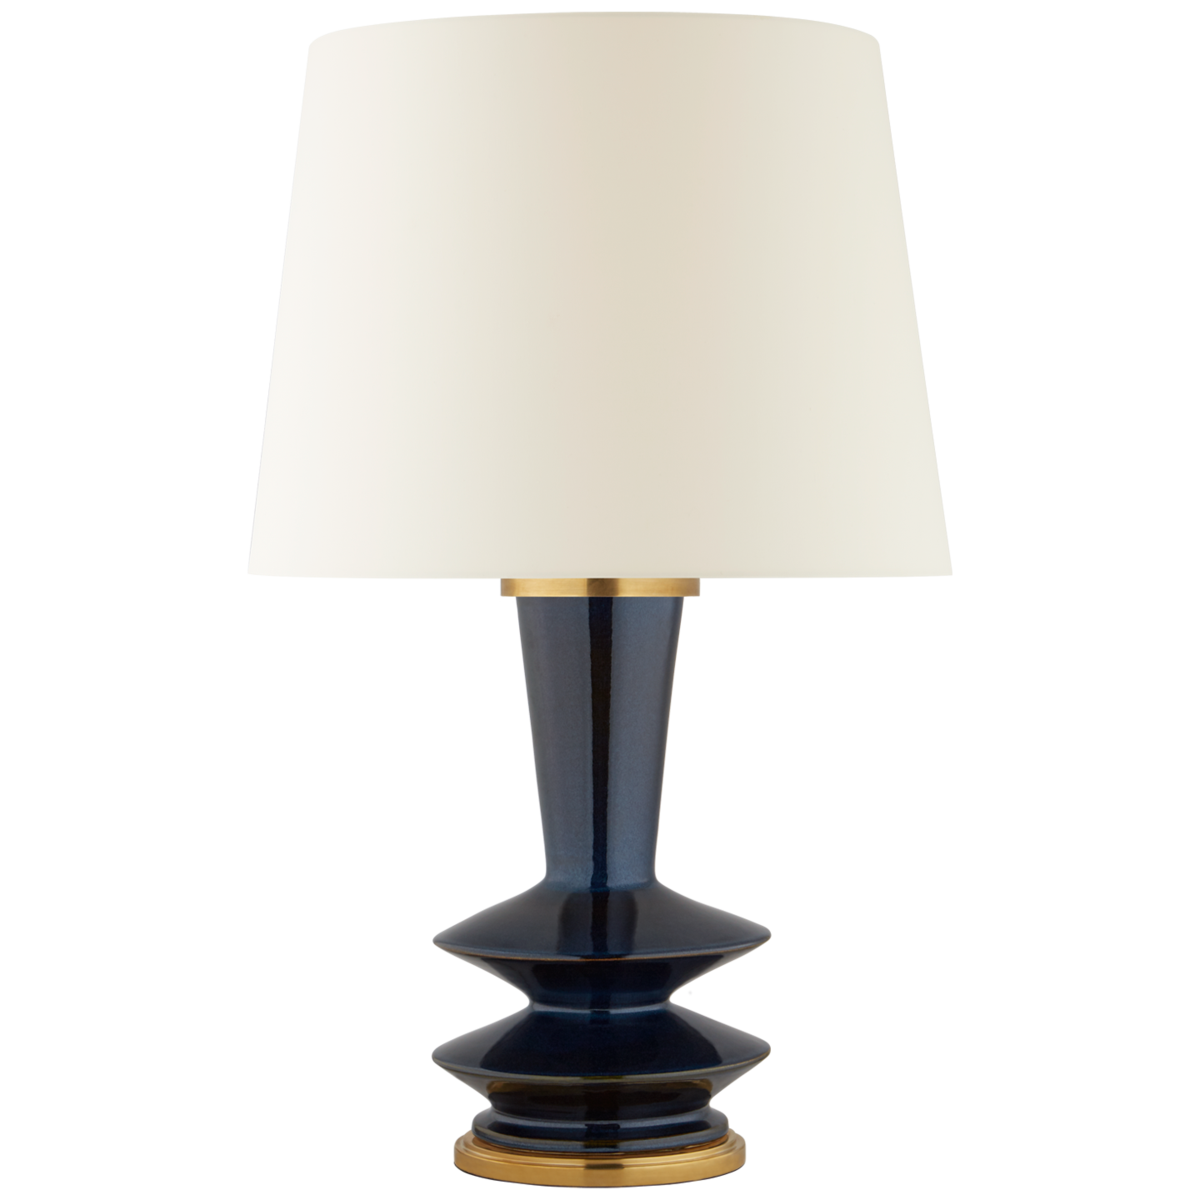 Whittaker Medium Table Lamp